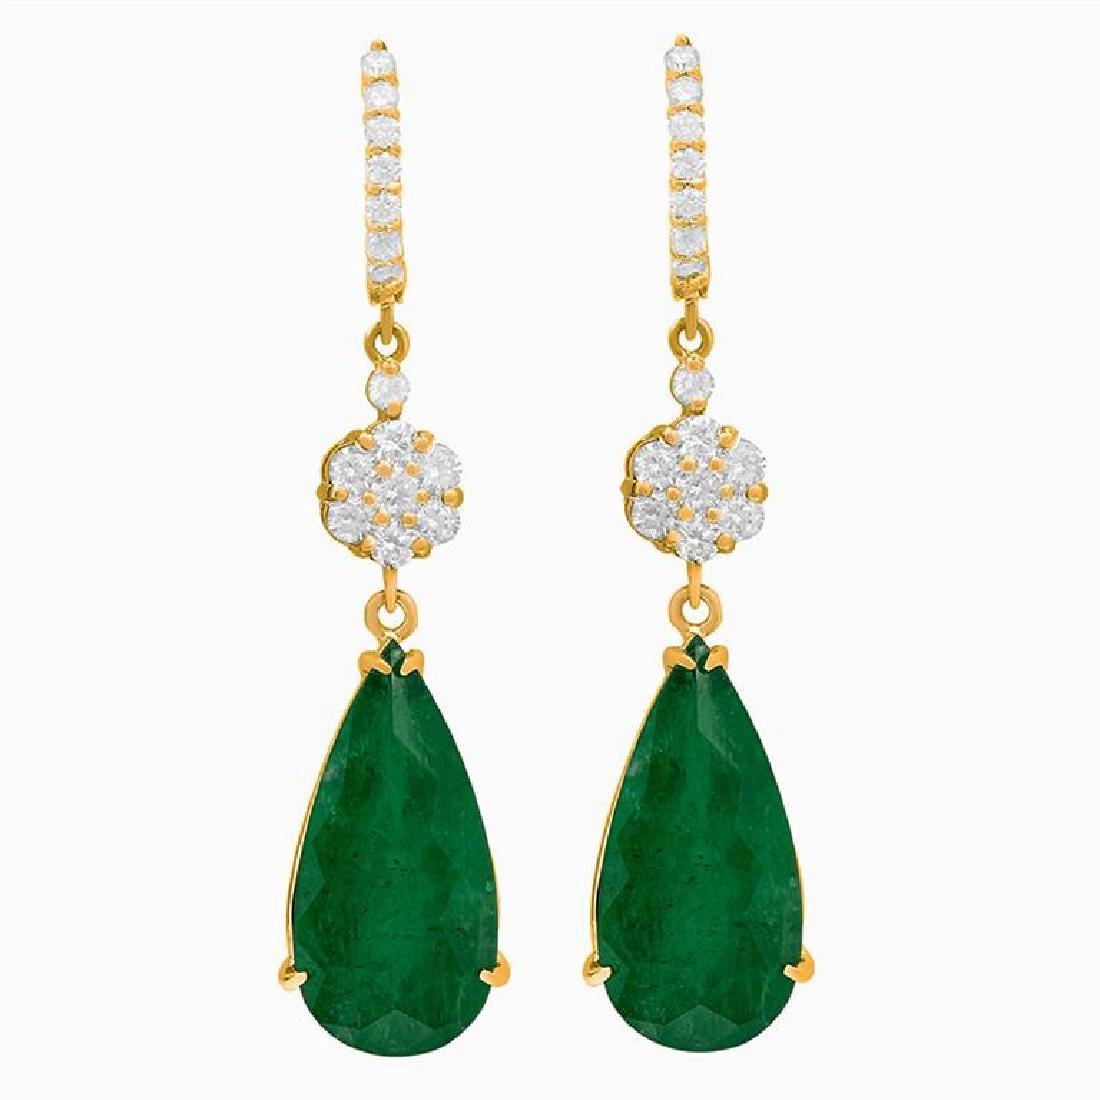 14k Yellow Gold 19.94ct Emerald 2.11ct Diamond Earrings